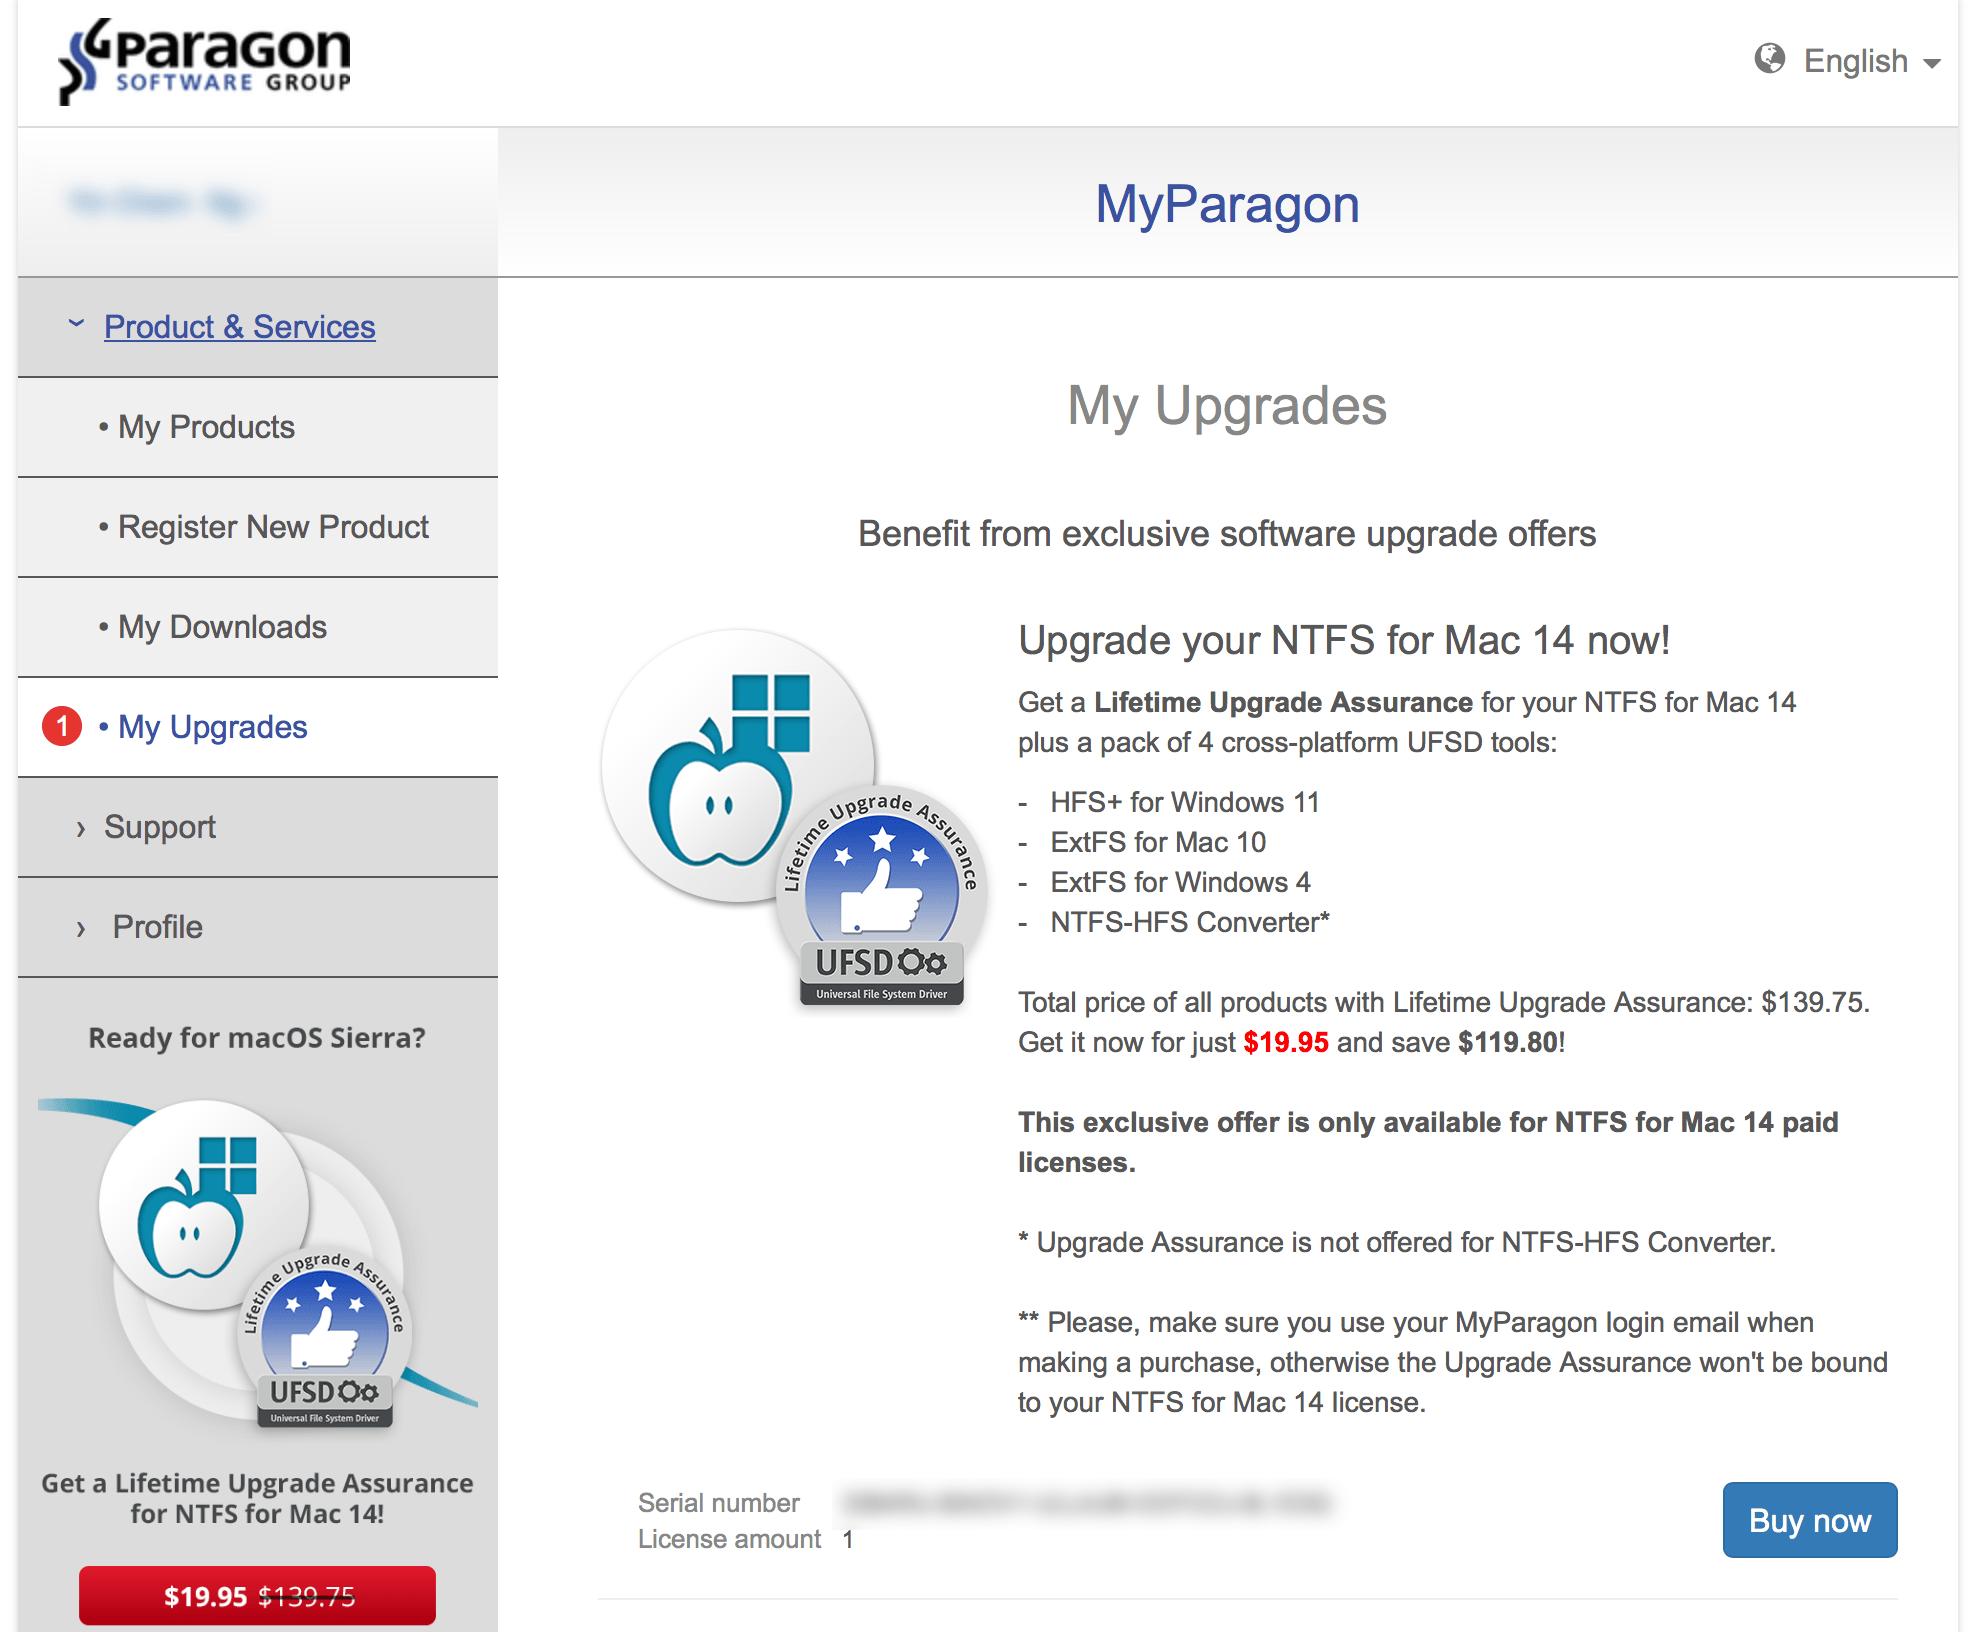 Get a lifetime upgrade assurance for Paragon NTFS for Mac!